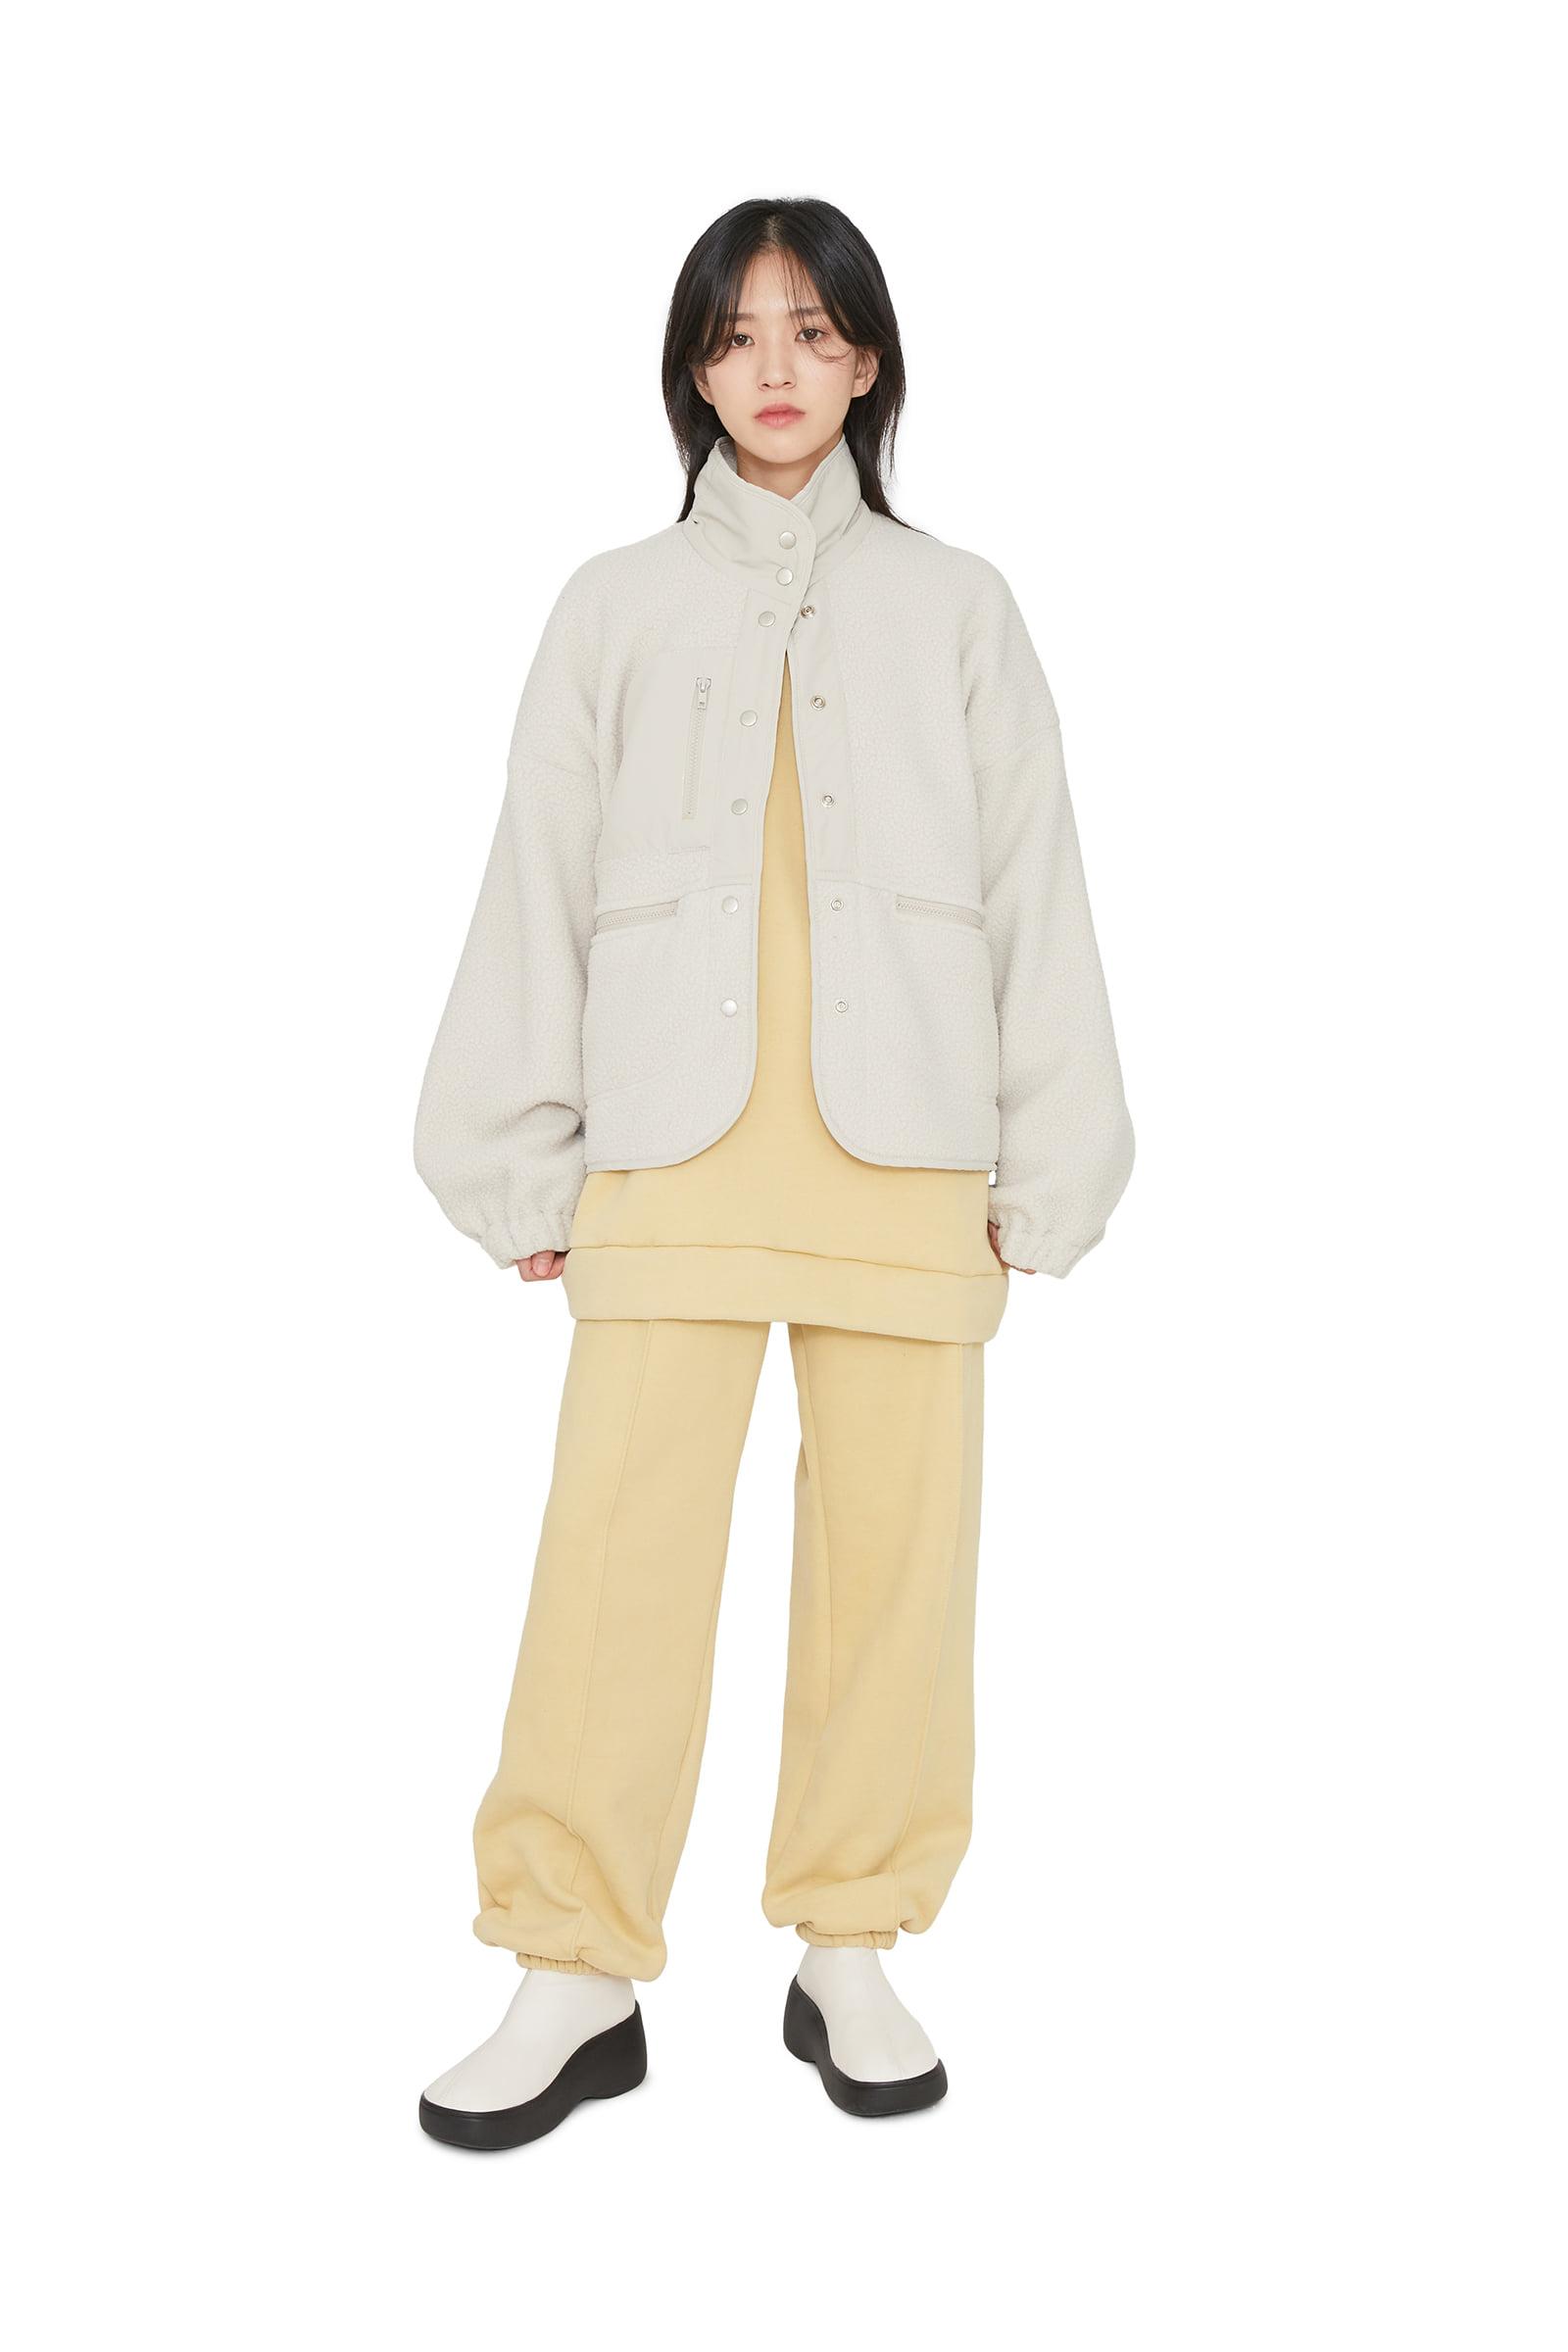 Roy fleece bomber jacket